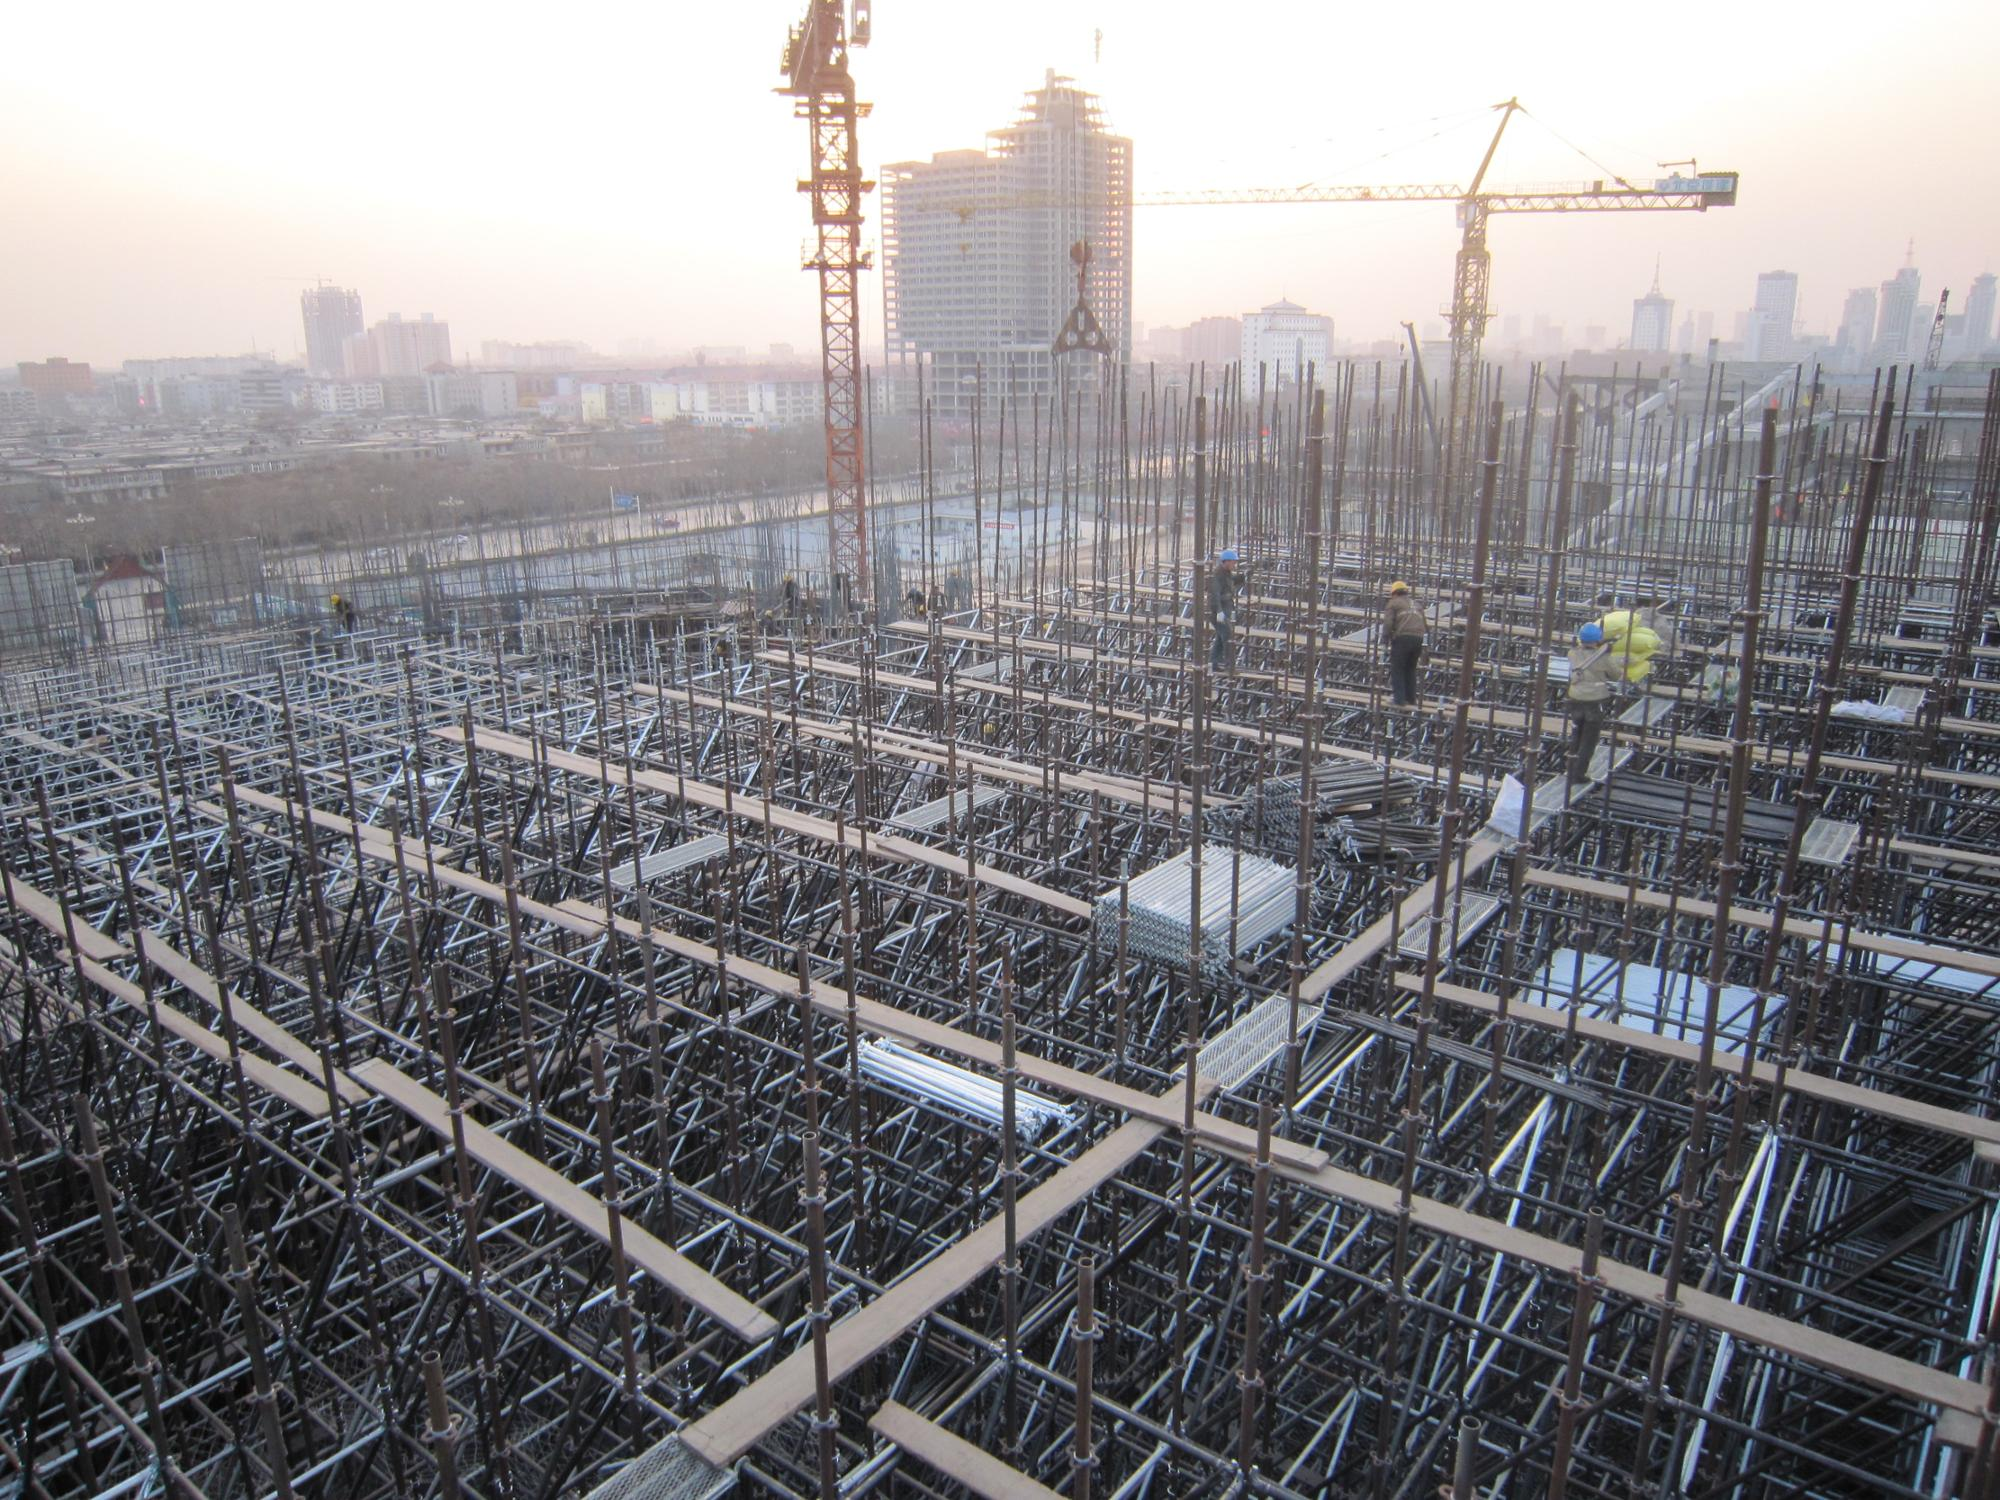 Easy Install Surelock Metal Ringlock Scaffolding System China Supplier -  Buy Ringlock Scaffolding System,Scaffolding System China,Surelock  Scaffolding